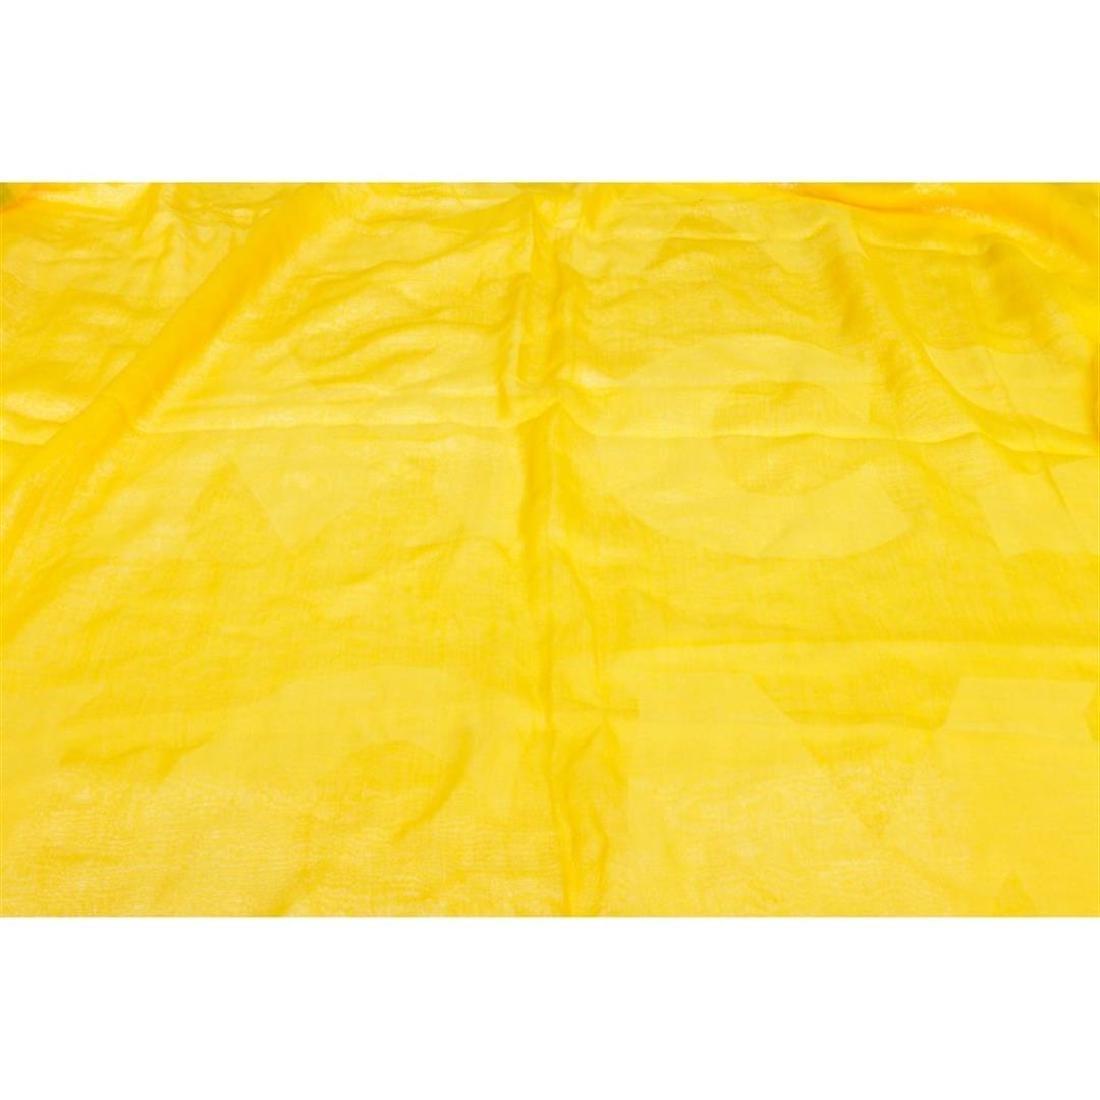 MCM Yellow Cotton Logo Scarf - 2